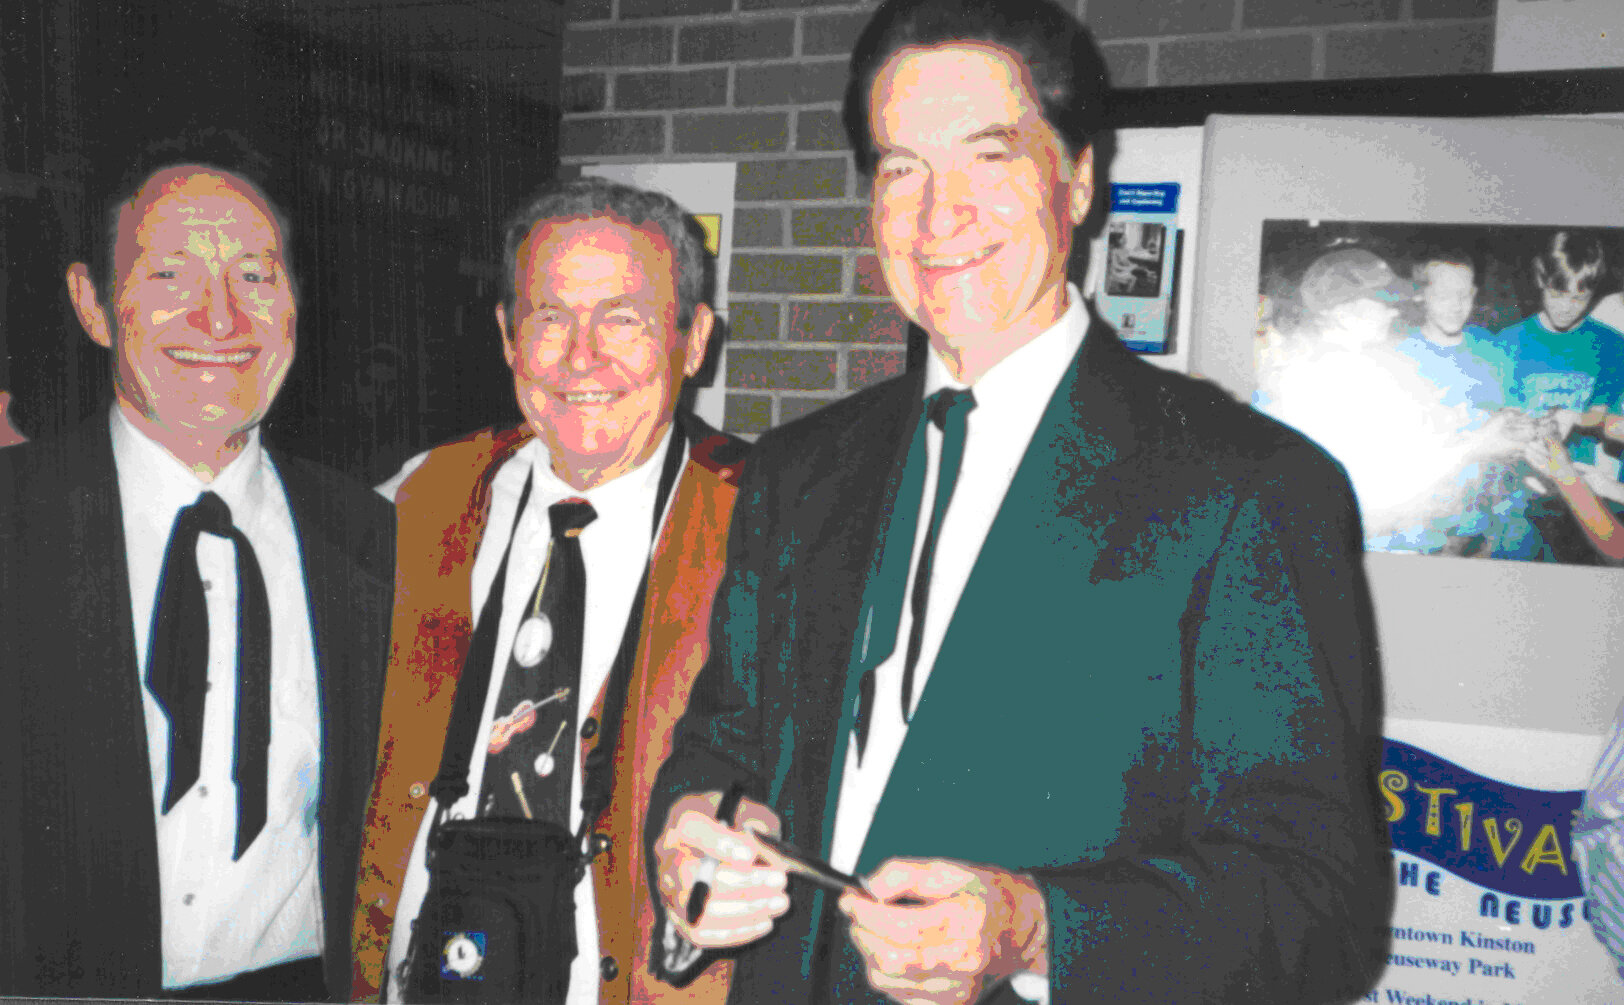 Jim and Jesse McReynolds